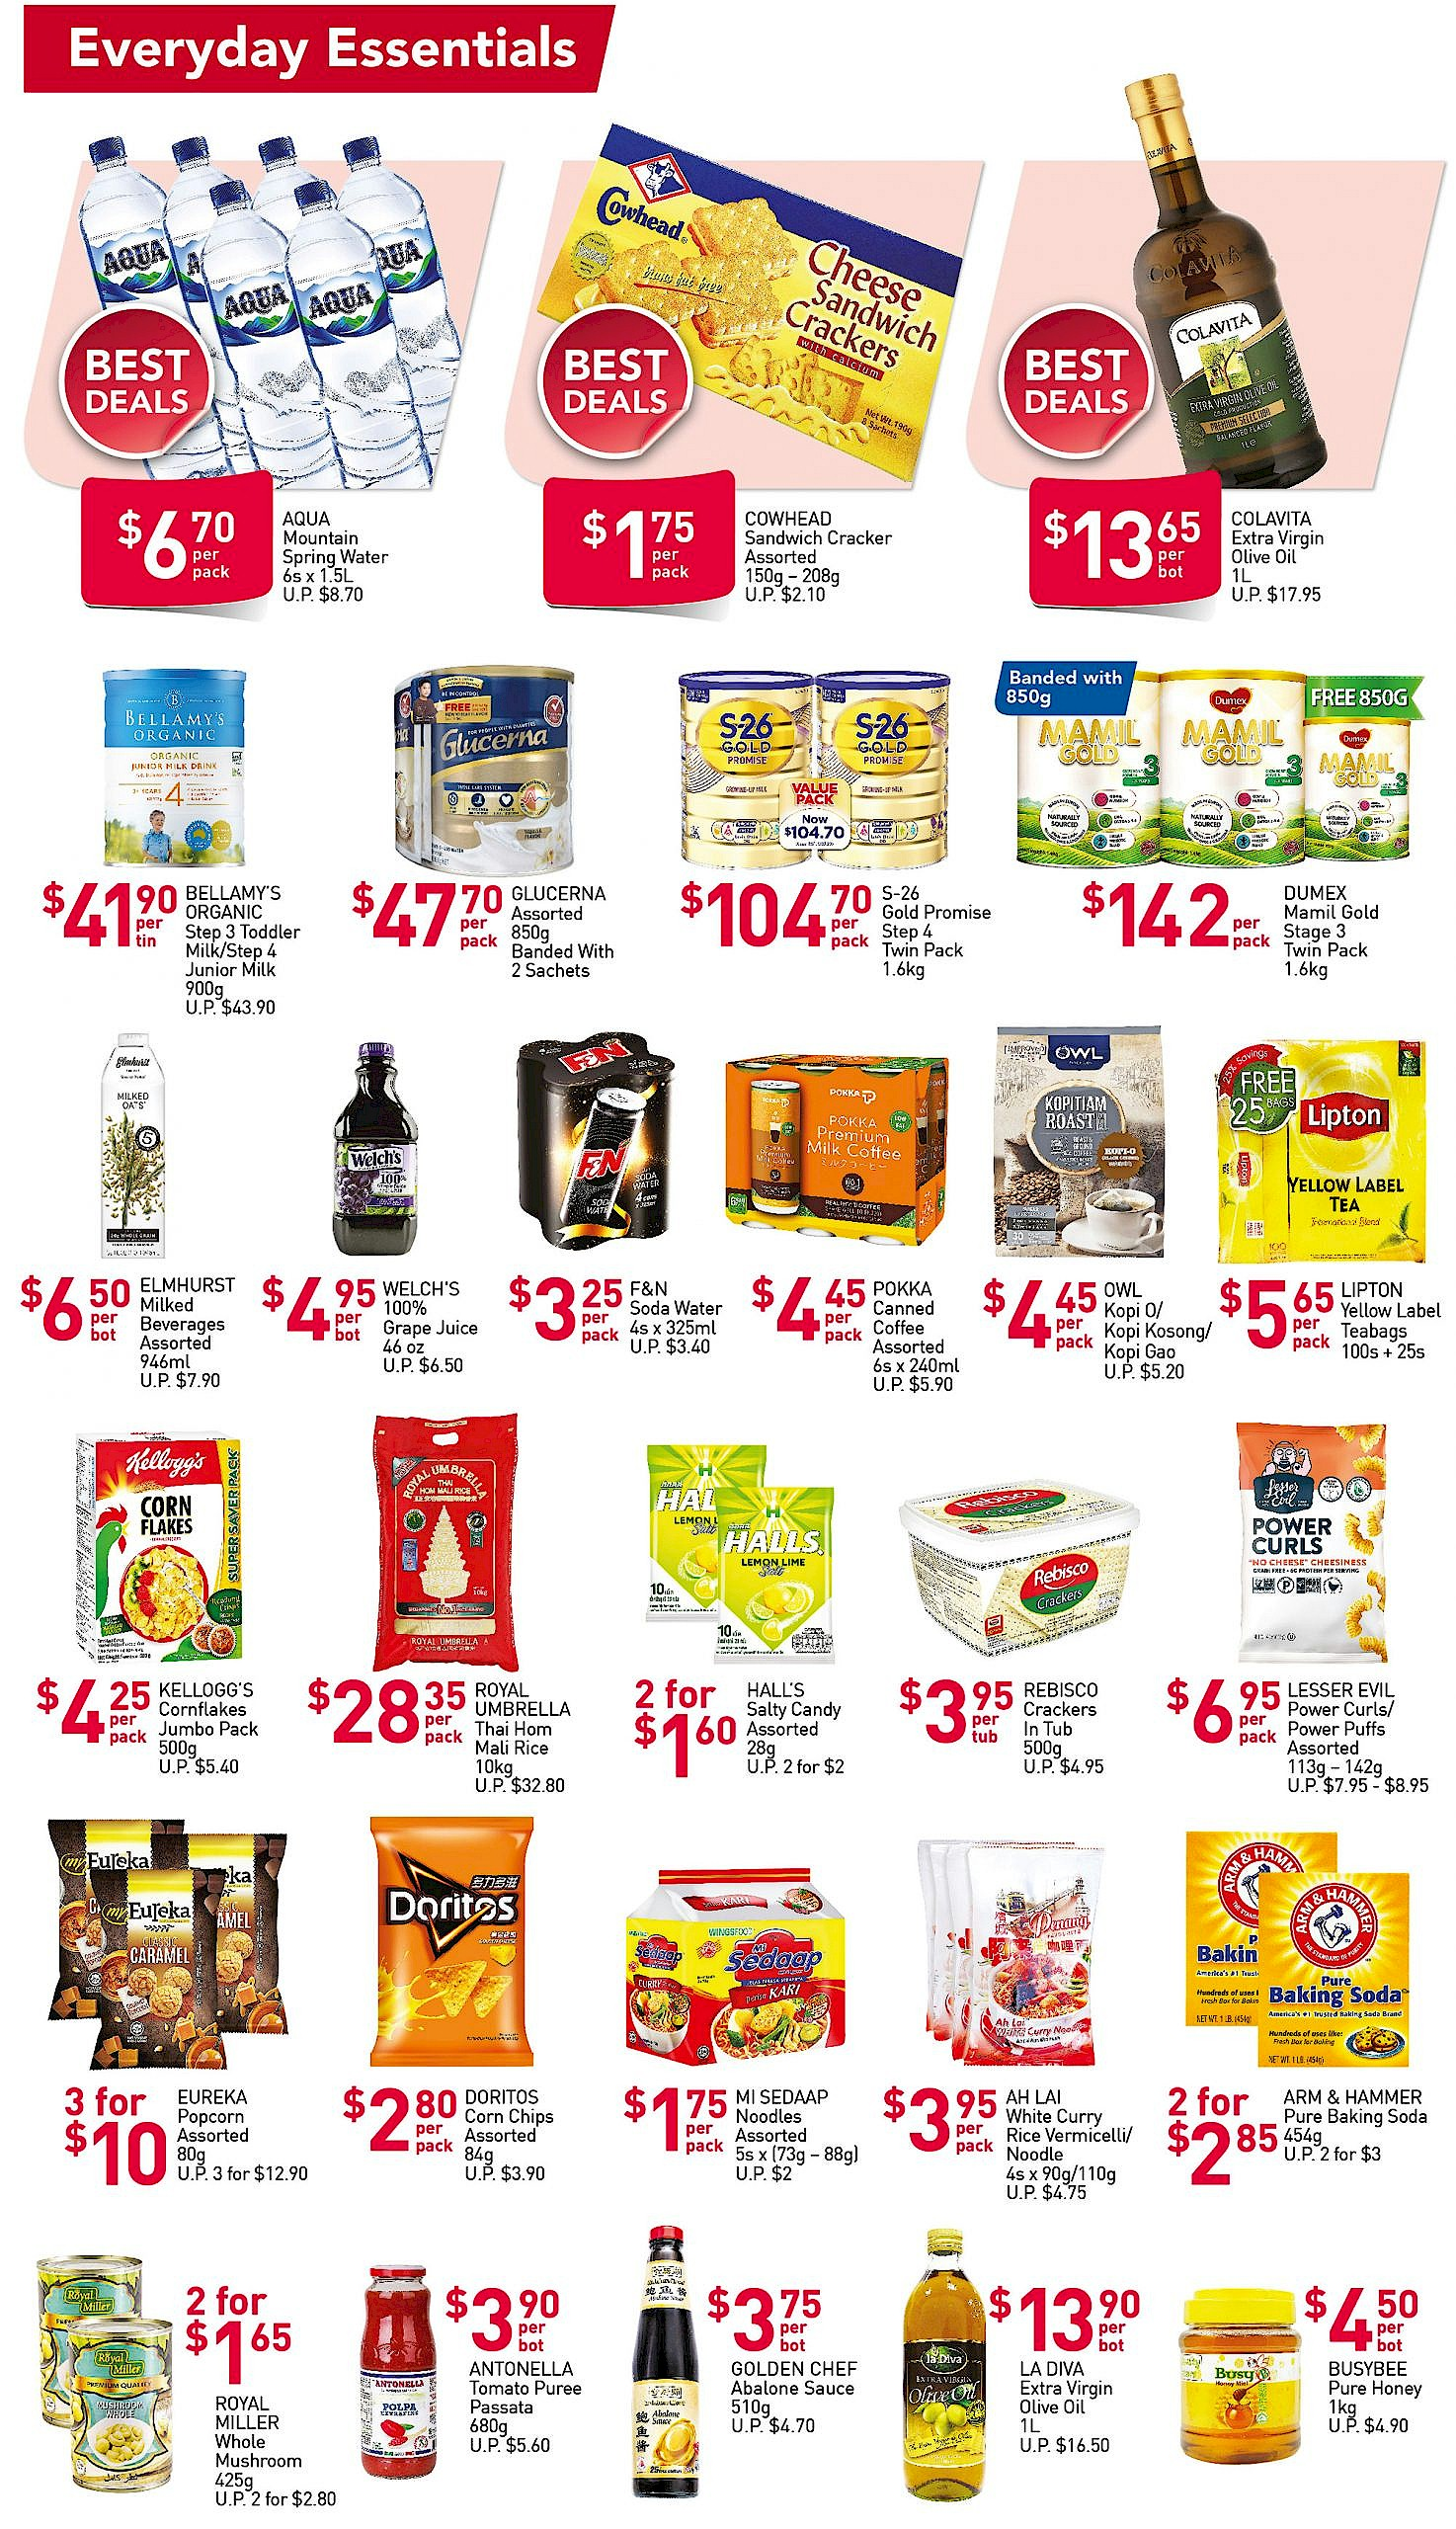 Fair-Price-Weekly-Saver-1